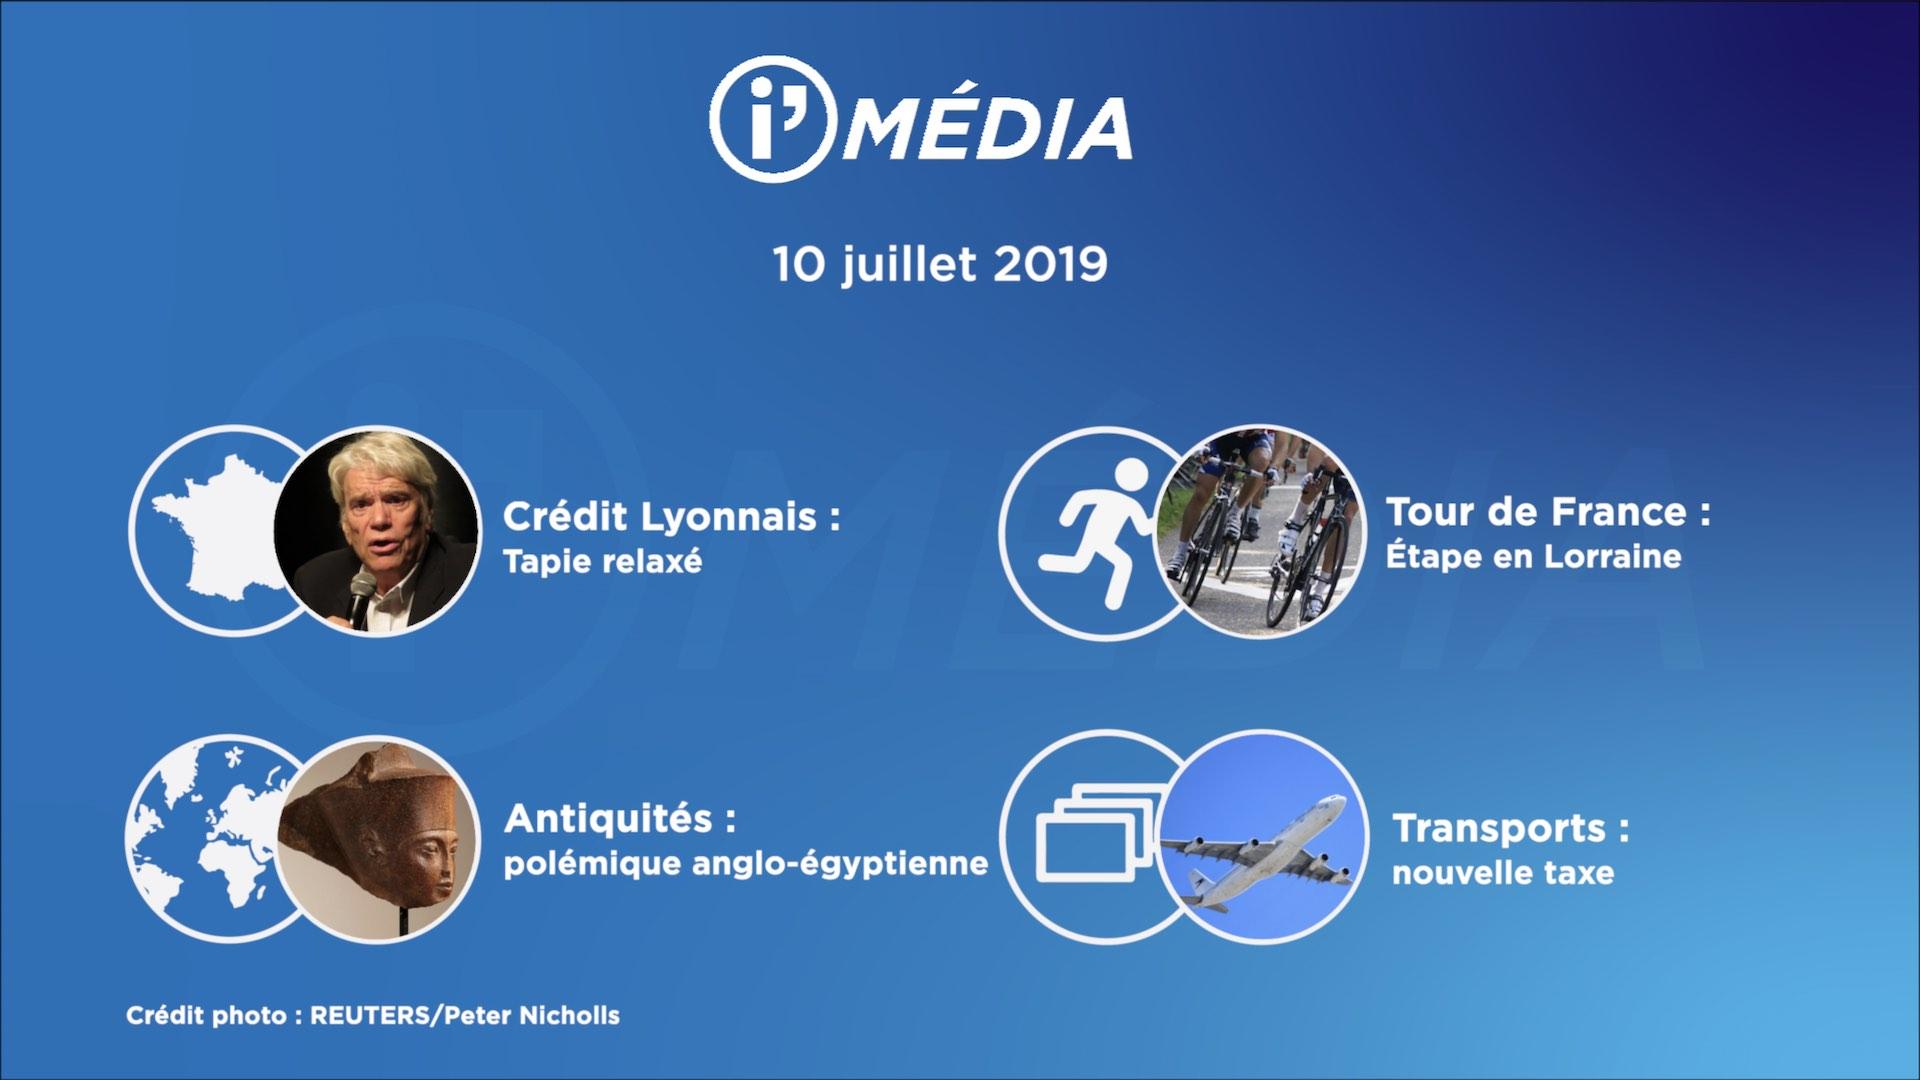 I'média 10 juillet 2019